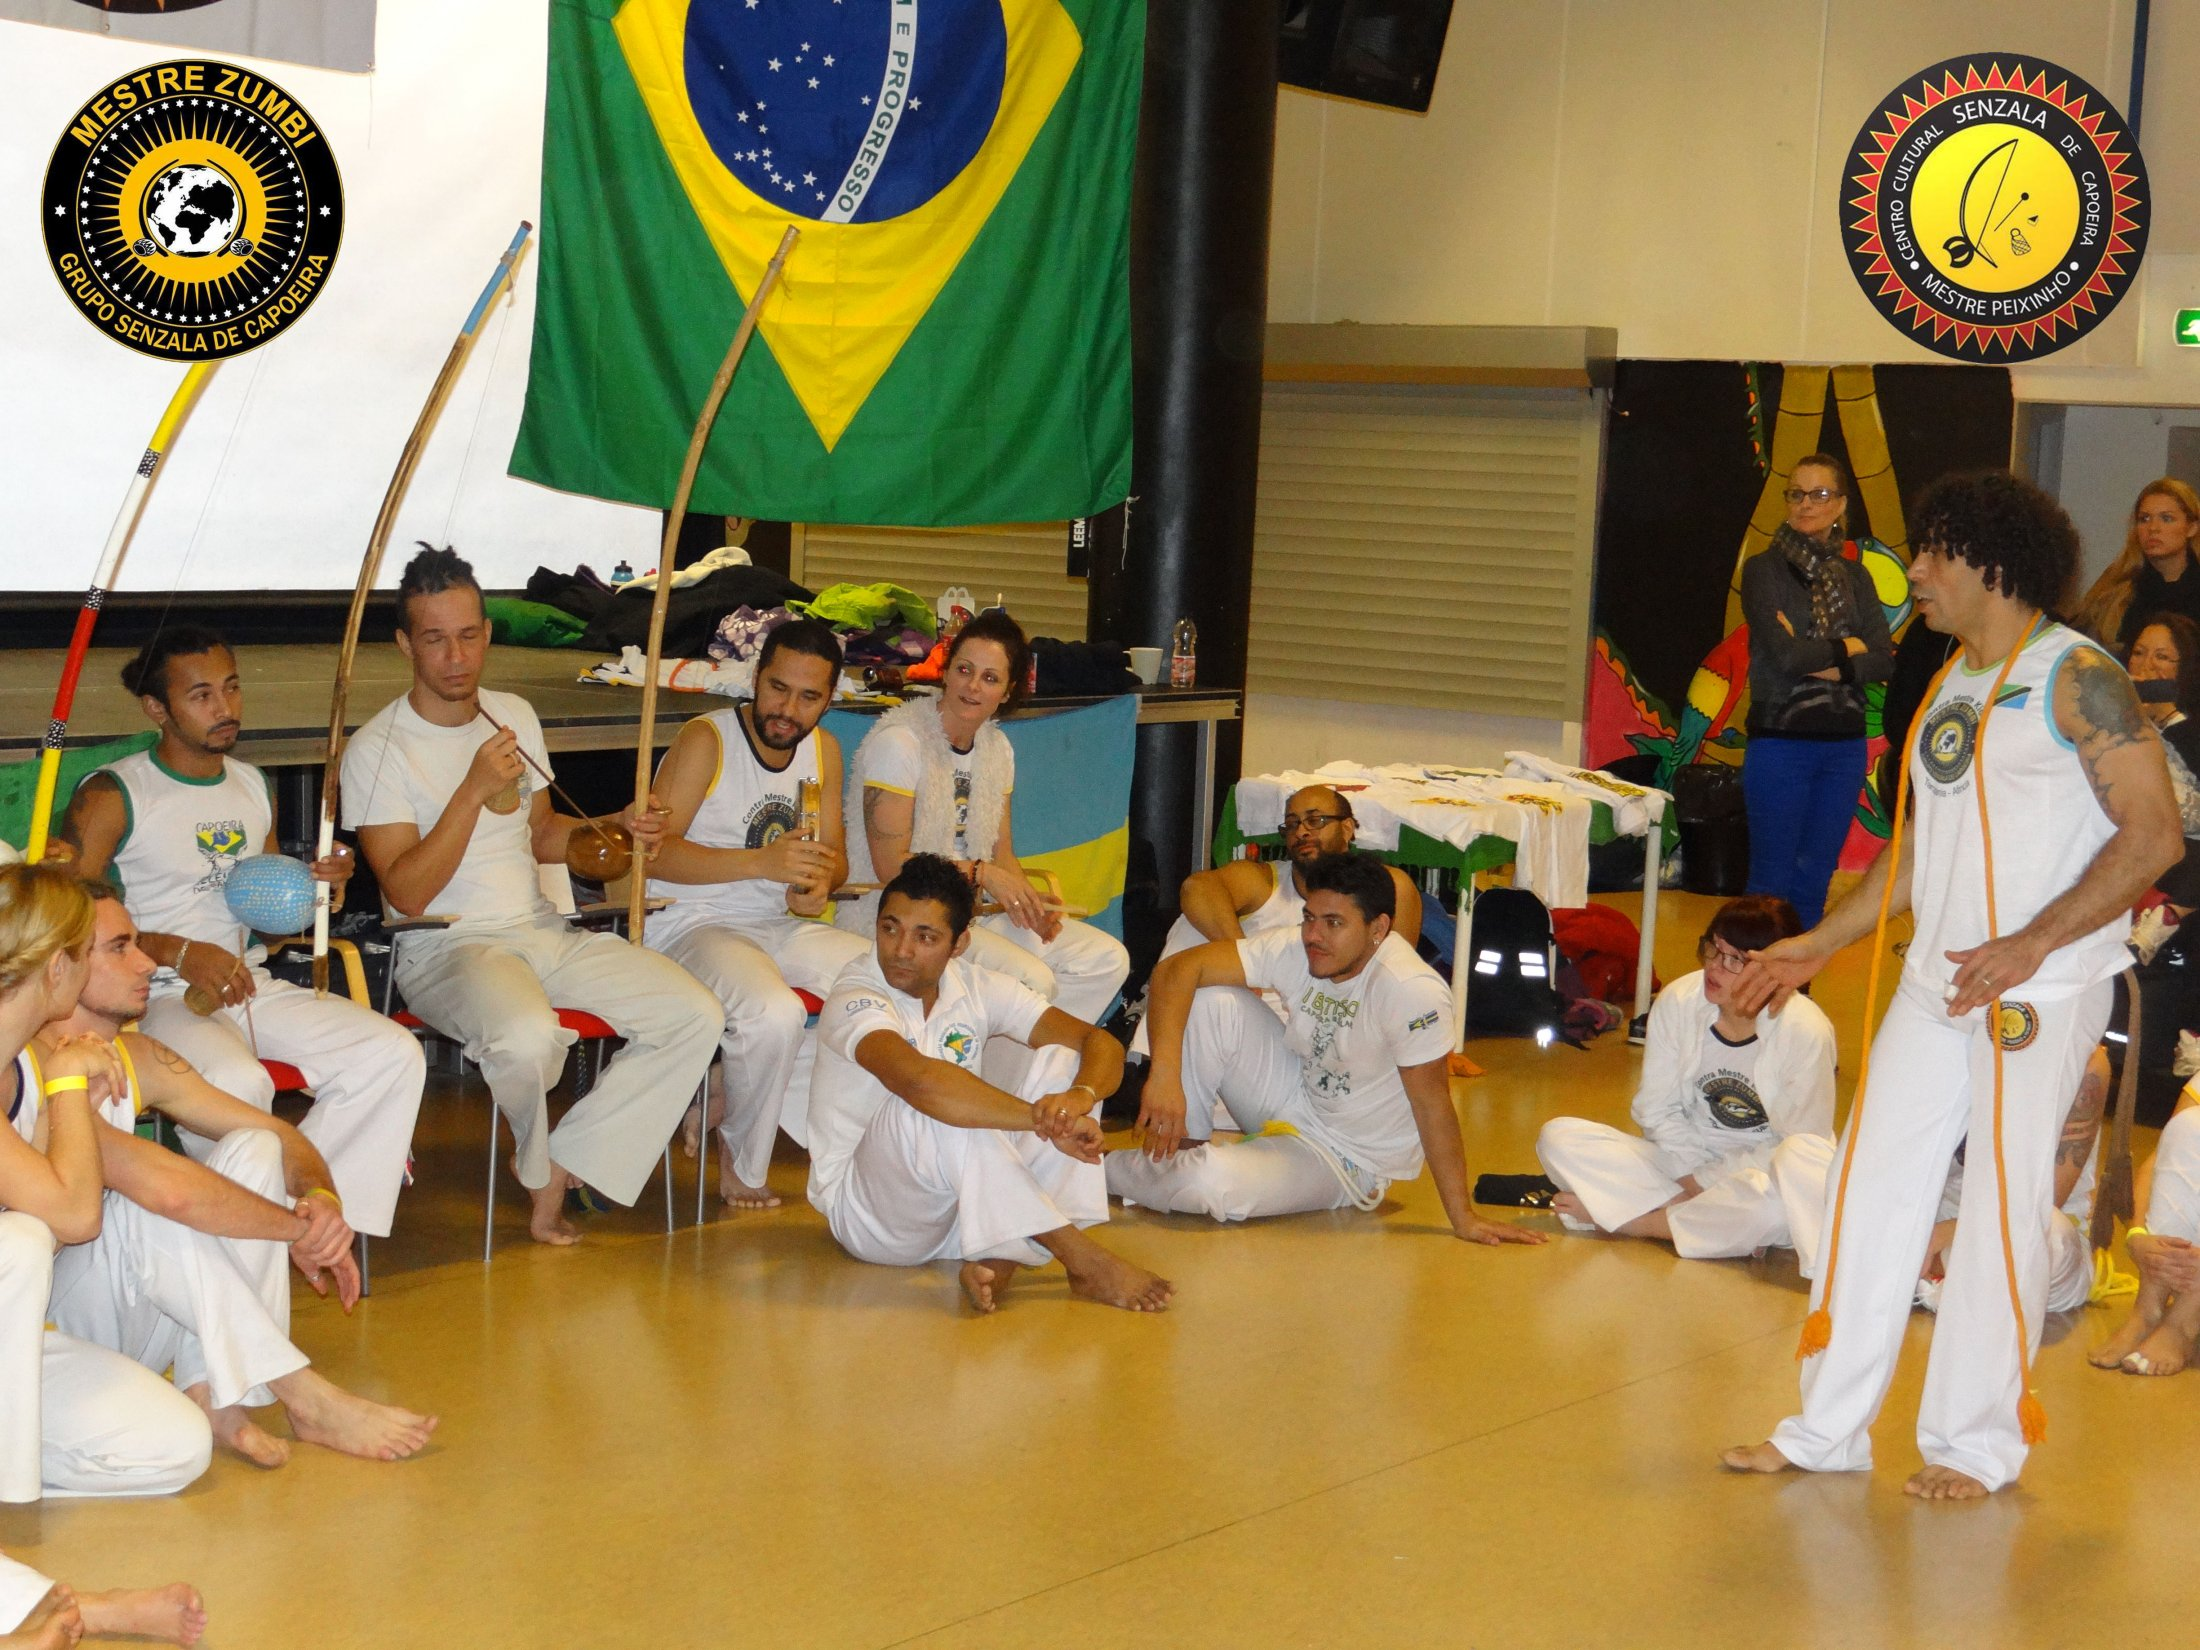 2013-12-14 - Capoeira 090